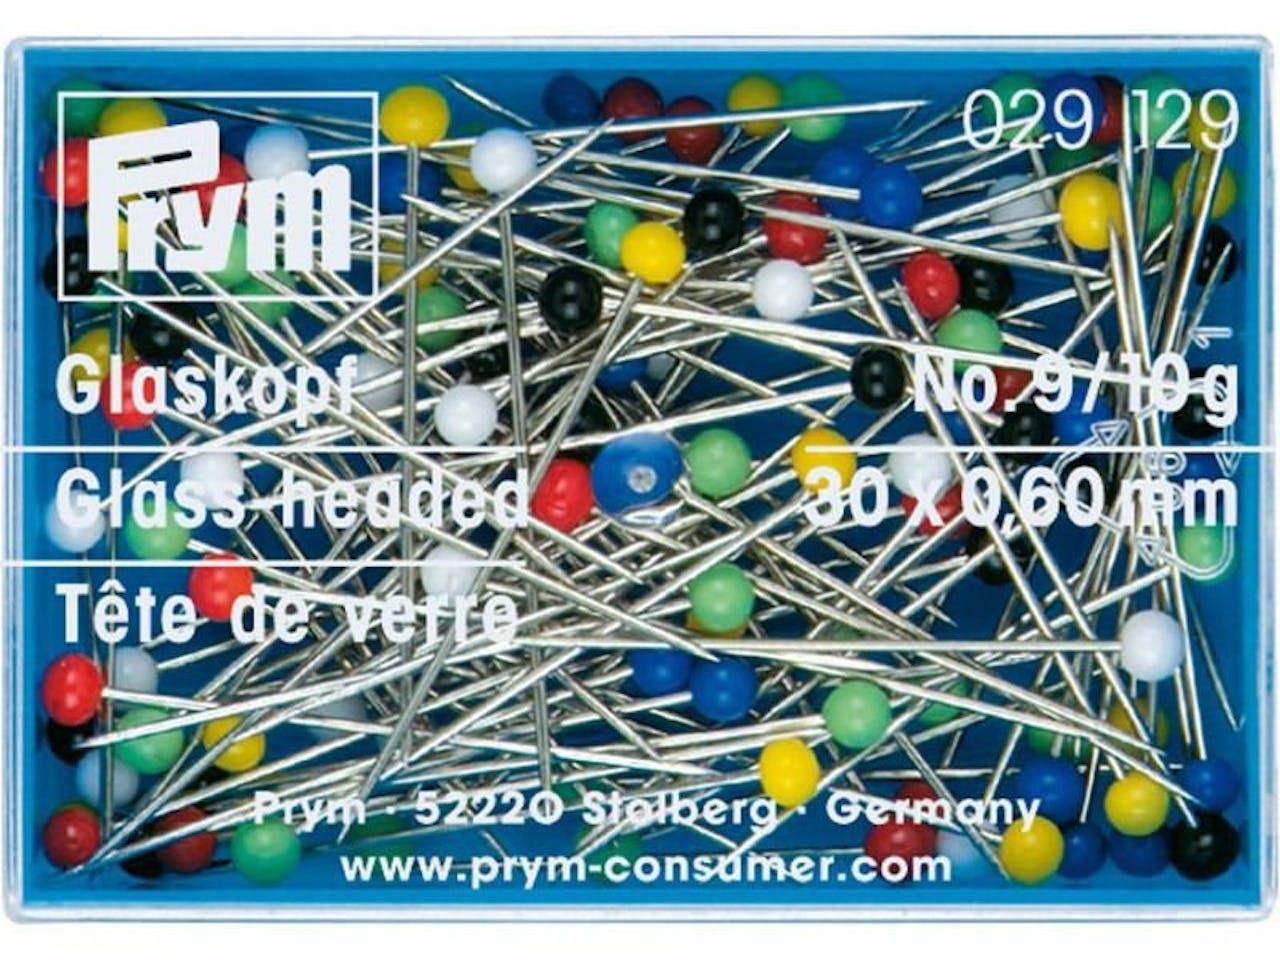 Prym Buntkopf-Stecknadel Glas, Stahl, gehärtet, bunt, 30 x 0,60 mm, 10 g in Kunststoffd. (029129)